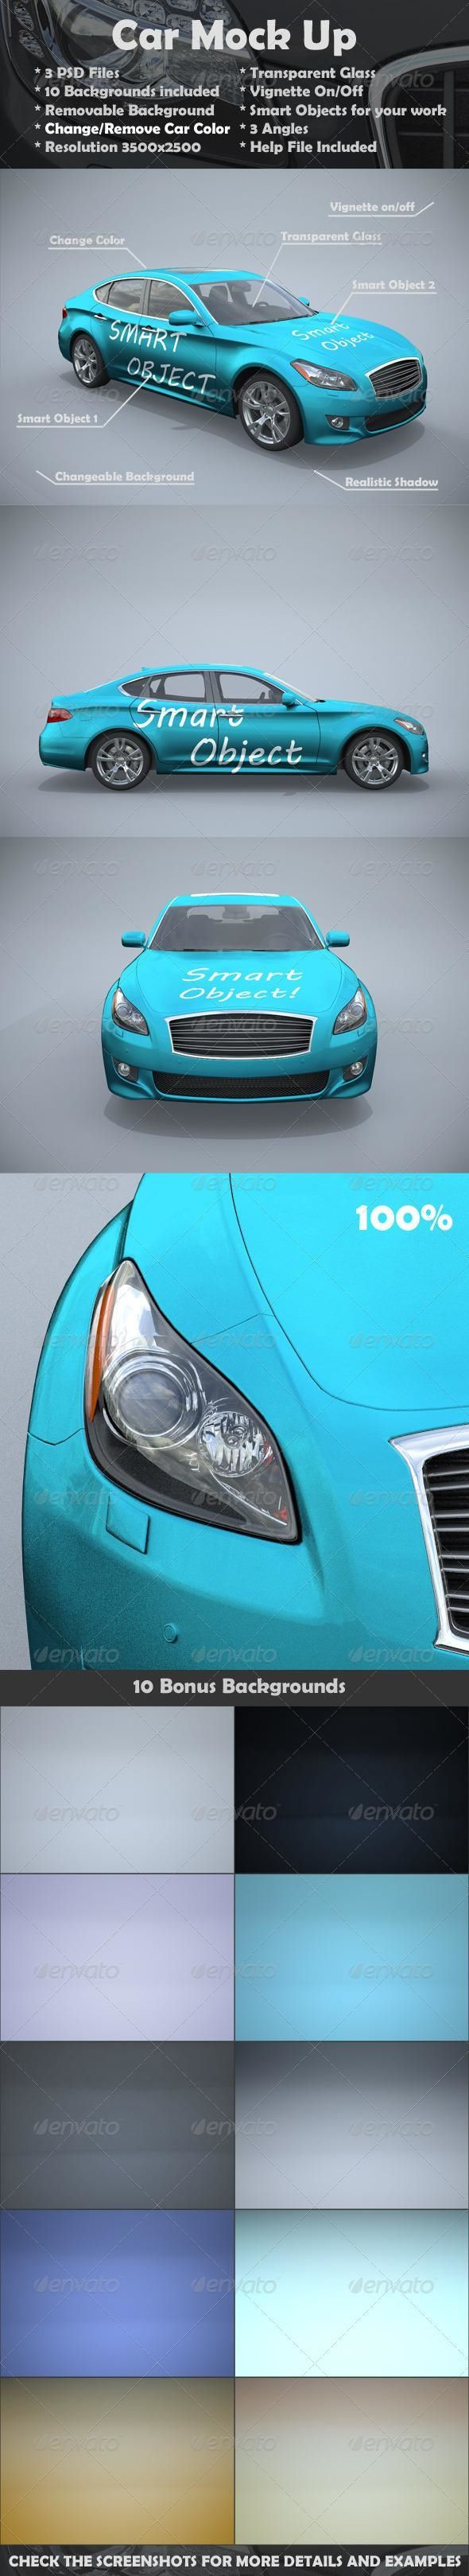 Car Mockups for 7 Envato mockups psd template